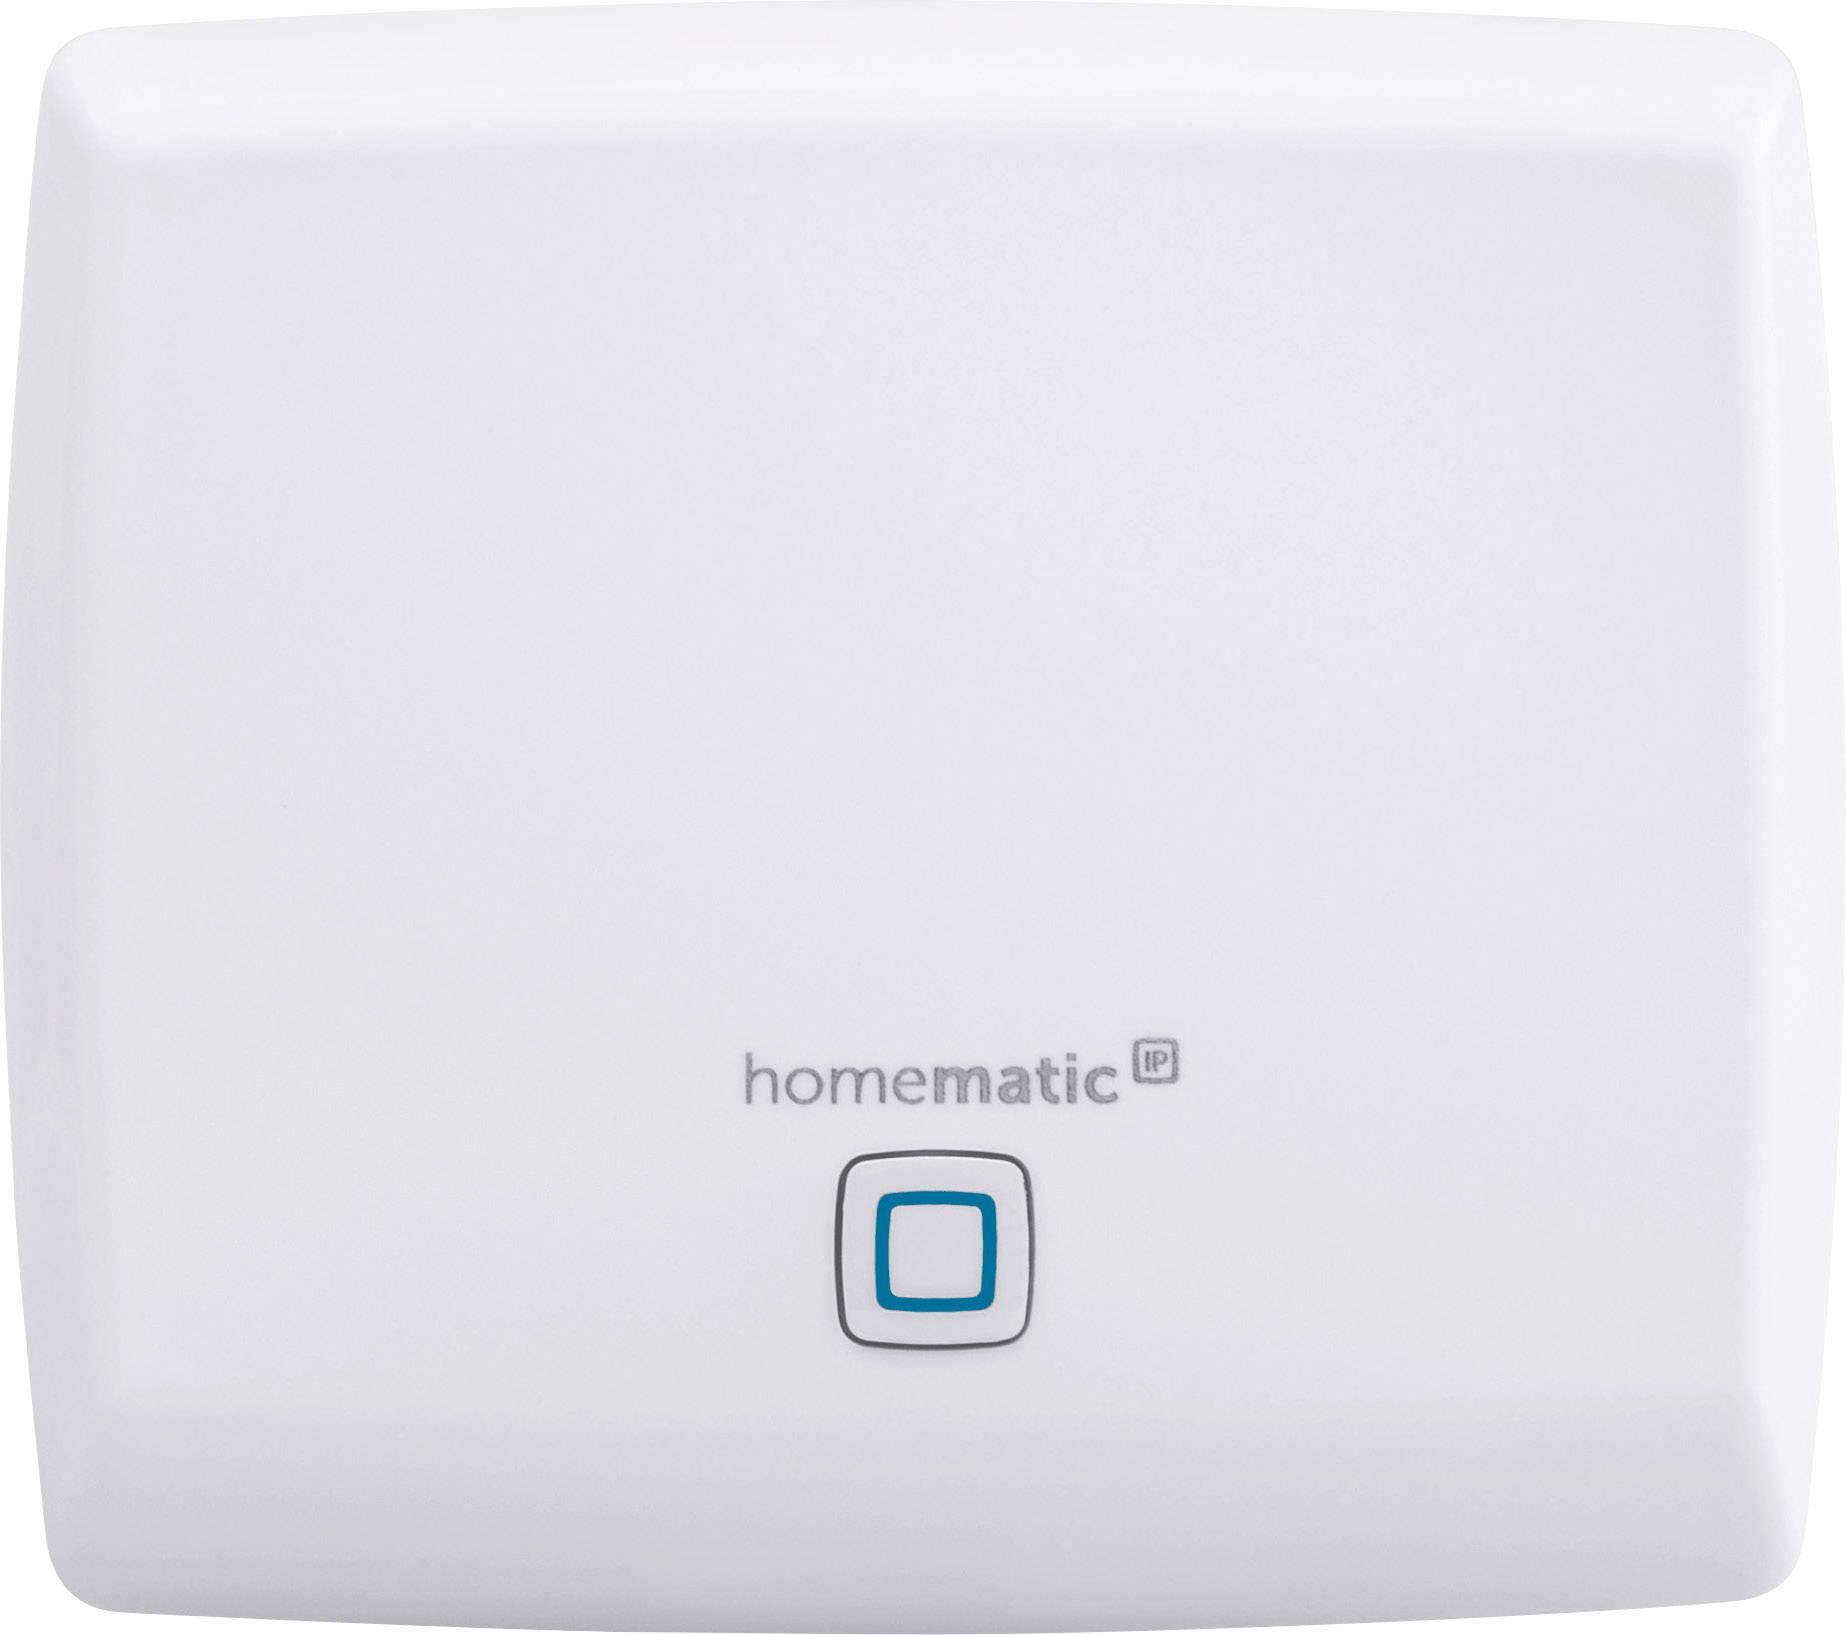 Bezdrôtová centrála Homematic IP Access Point, Max. dosah 150 m